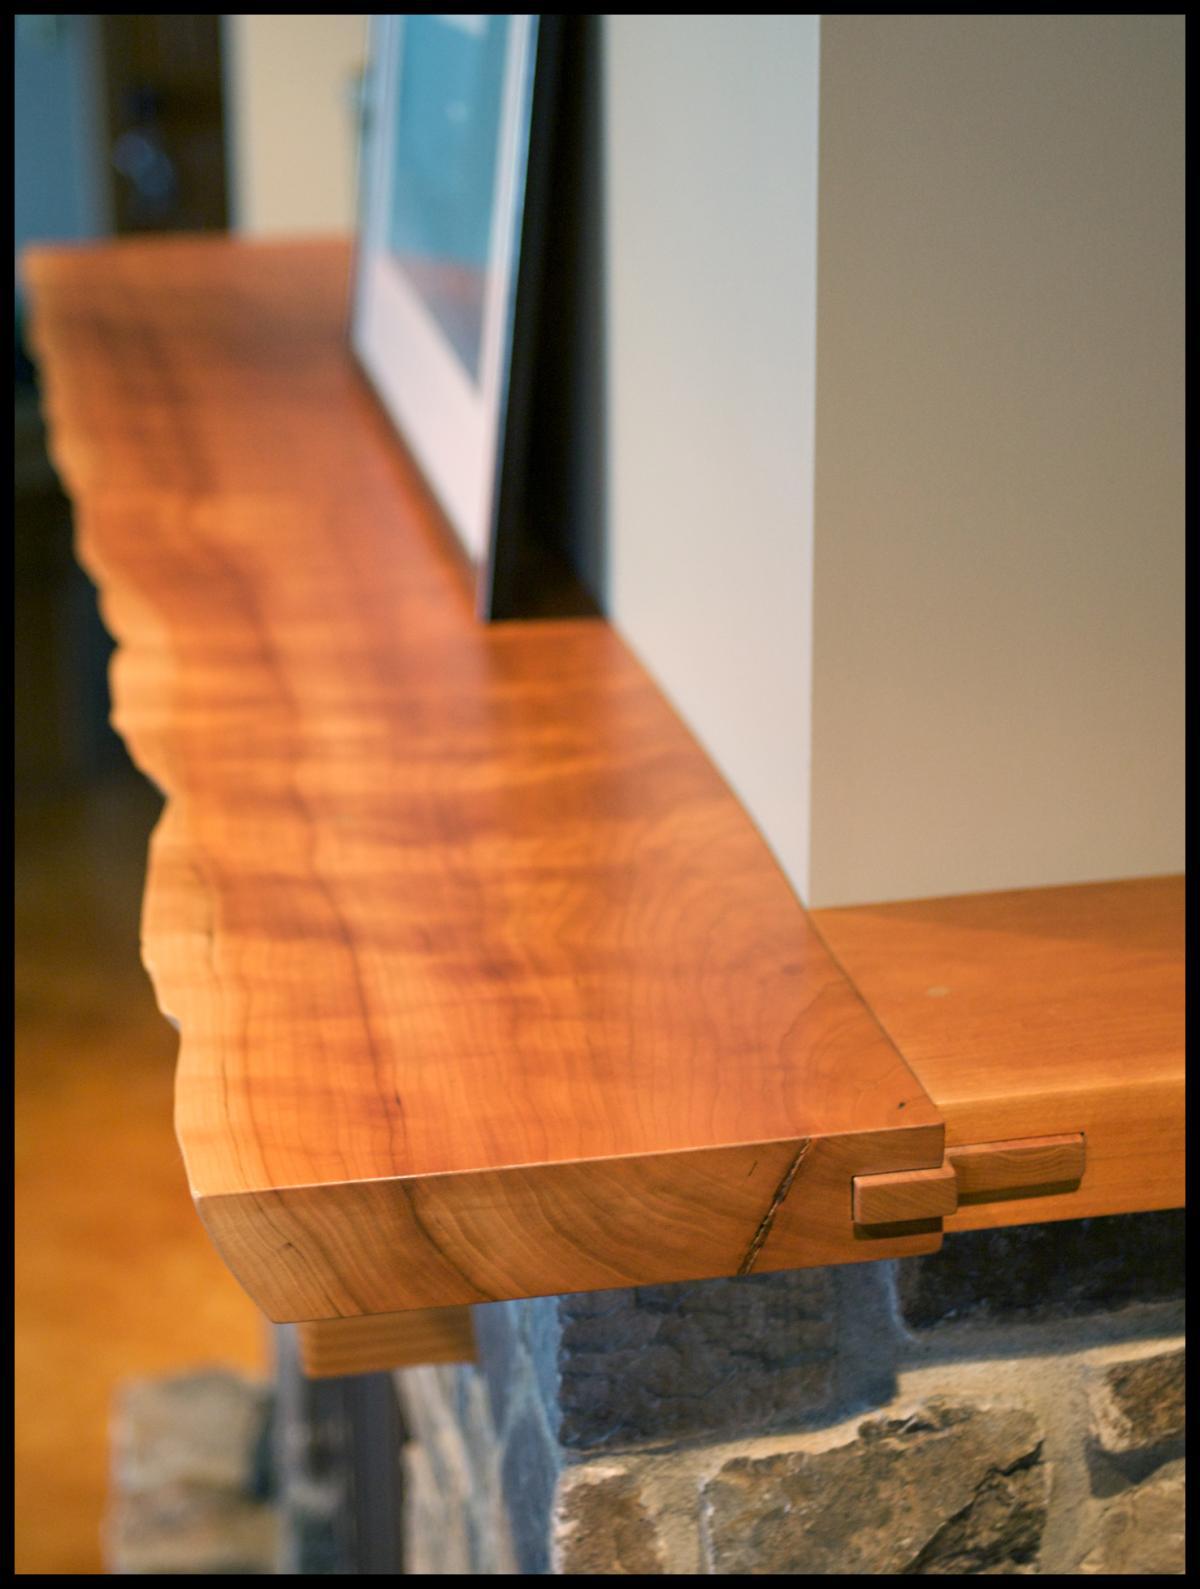 Seola Mantel Northwest Woodworkers Gallery